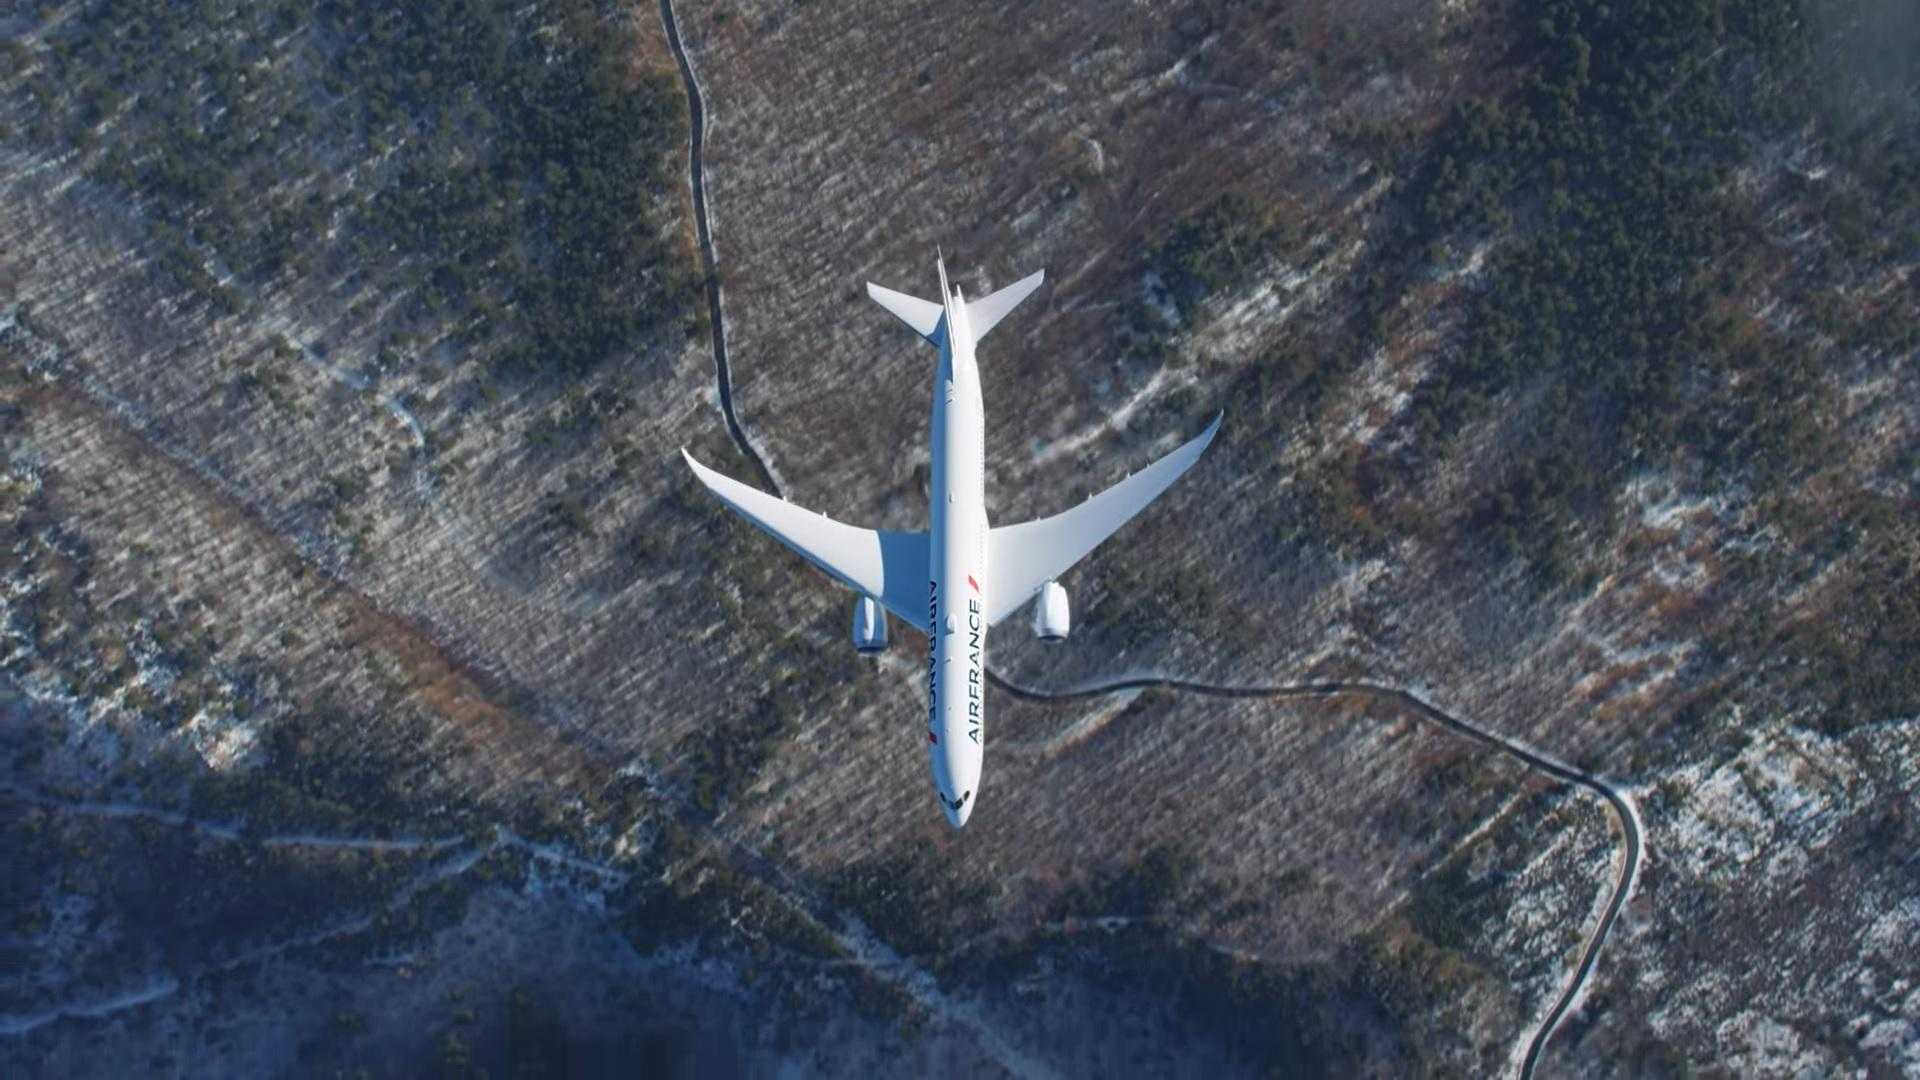 Luft-Luft-boeing-787-Air-France-show-1